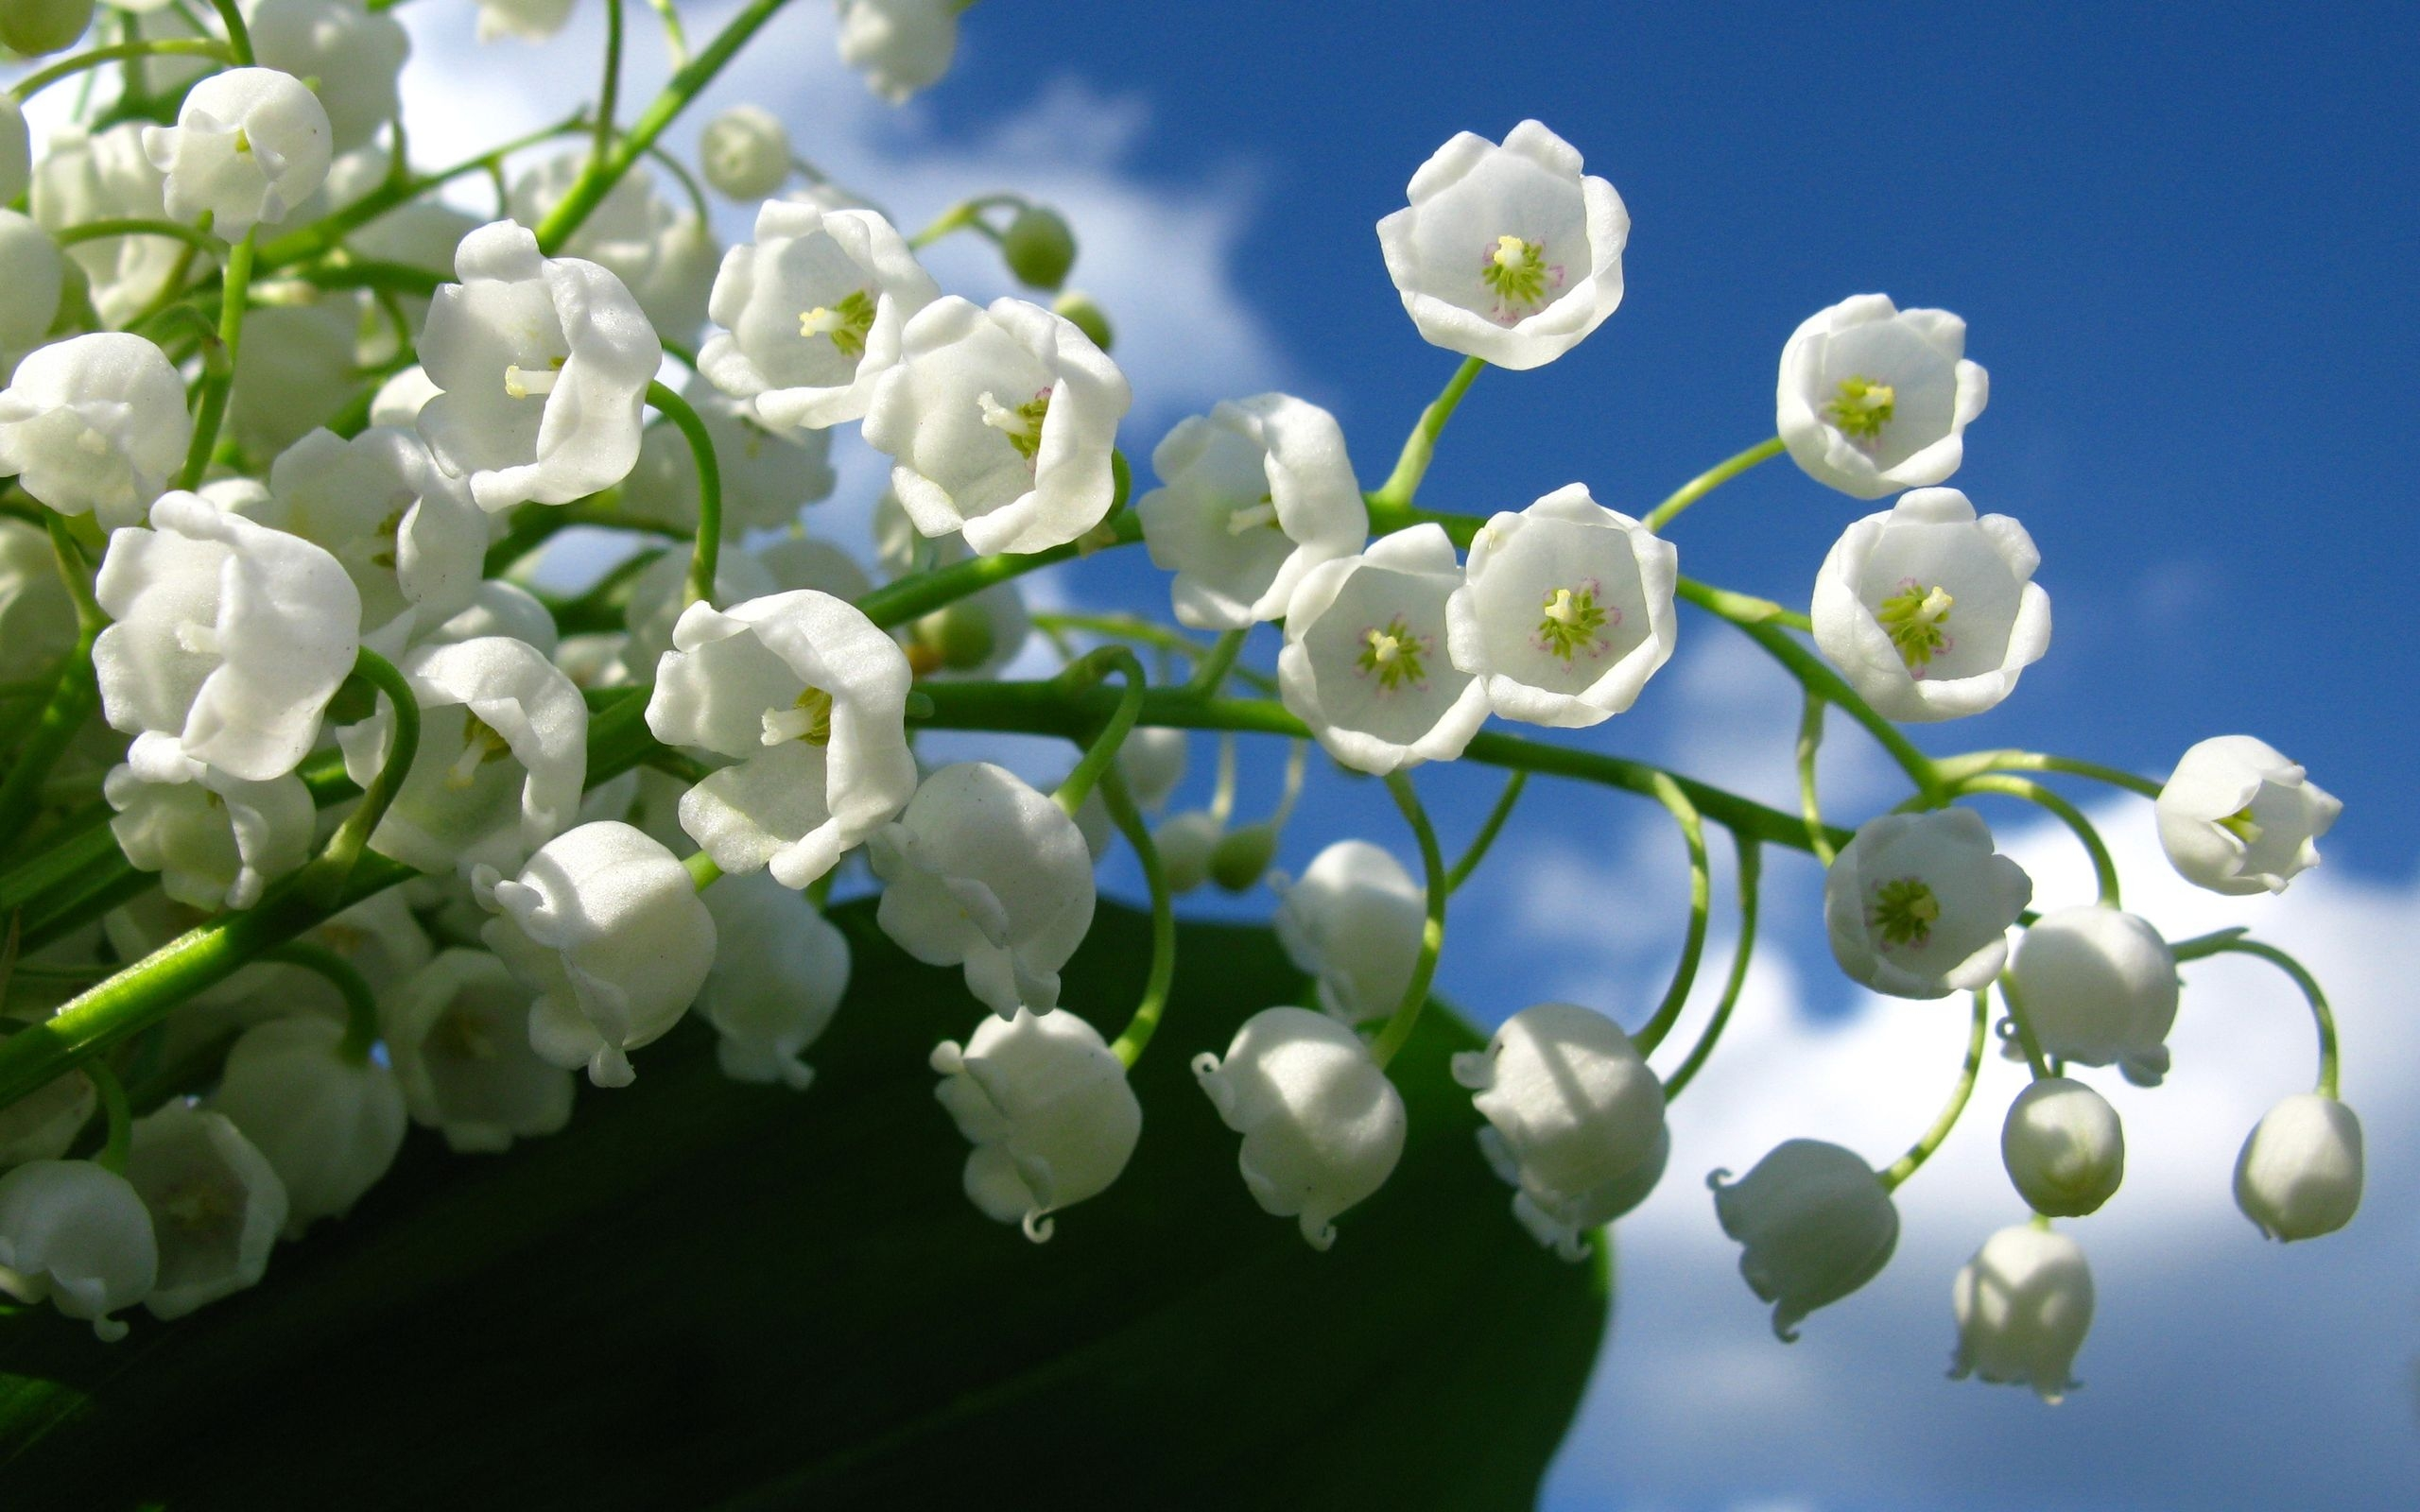 Little White Flowers Group